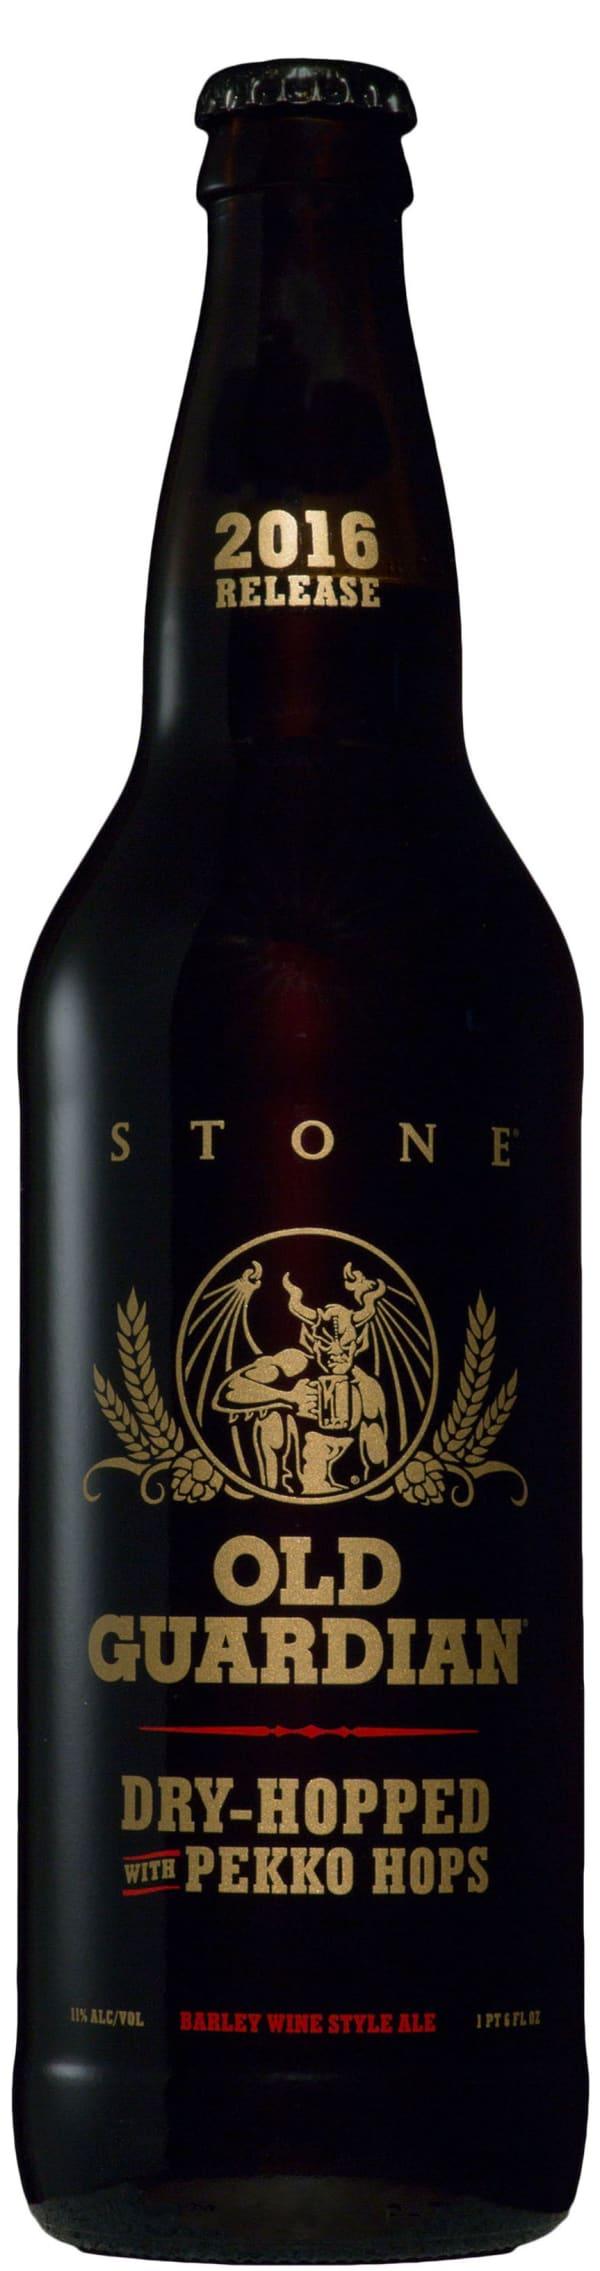 Stone Old Guardian 2016 Release Barley Wine